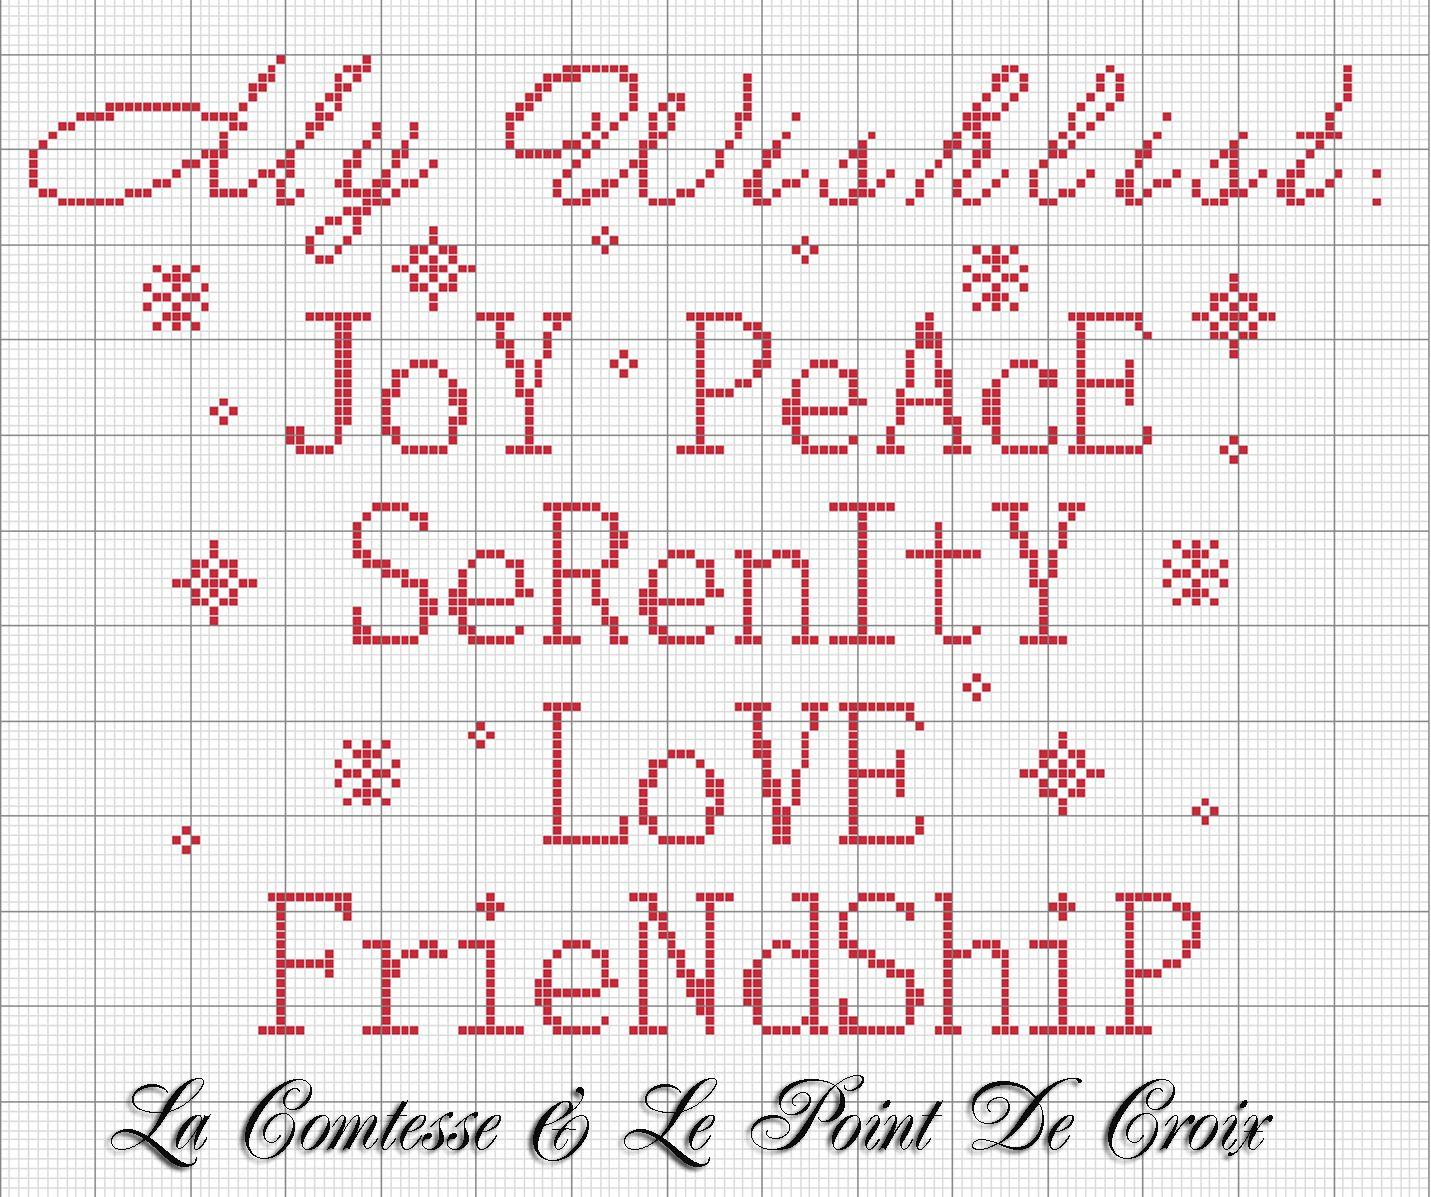 Lacomtesse: My wishlist... e la vostra???